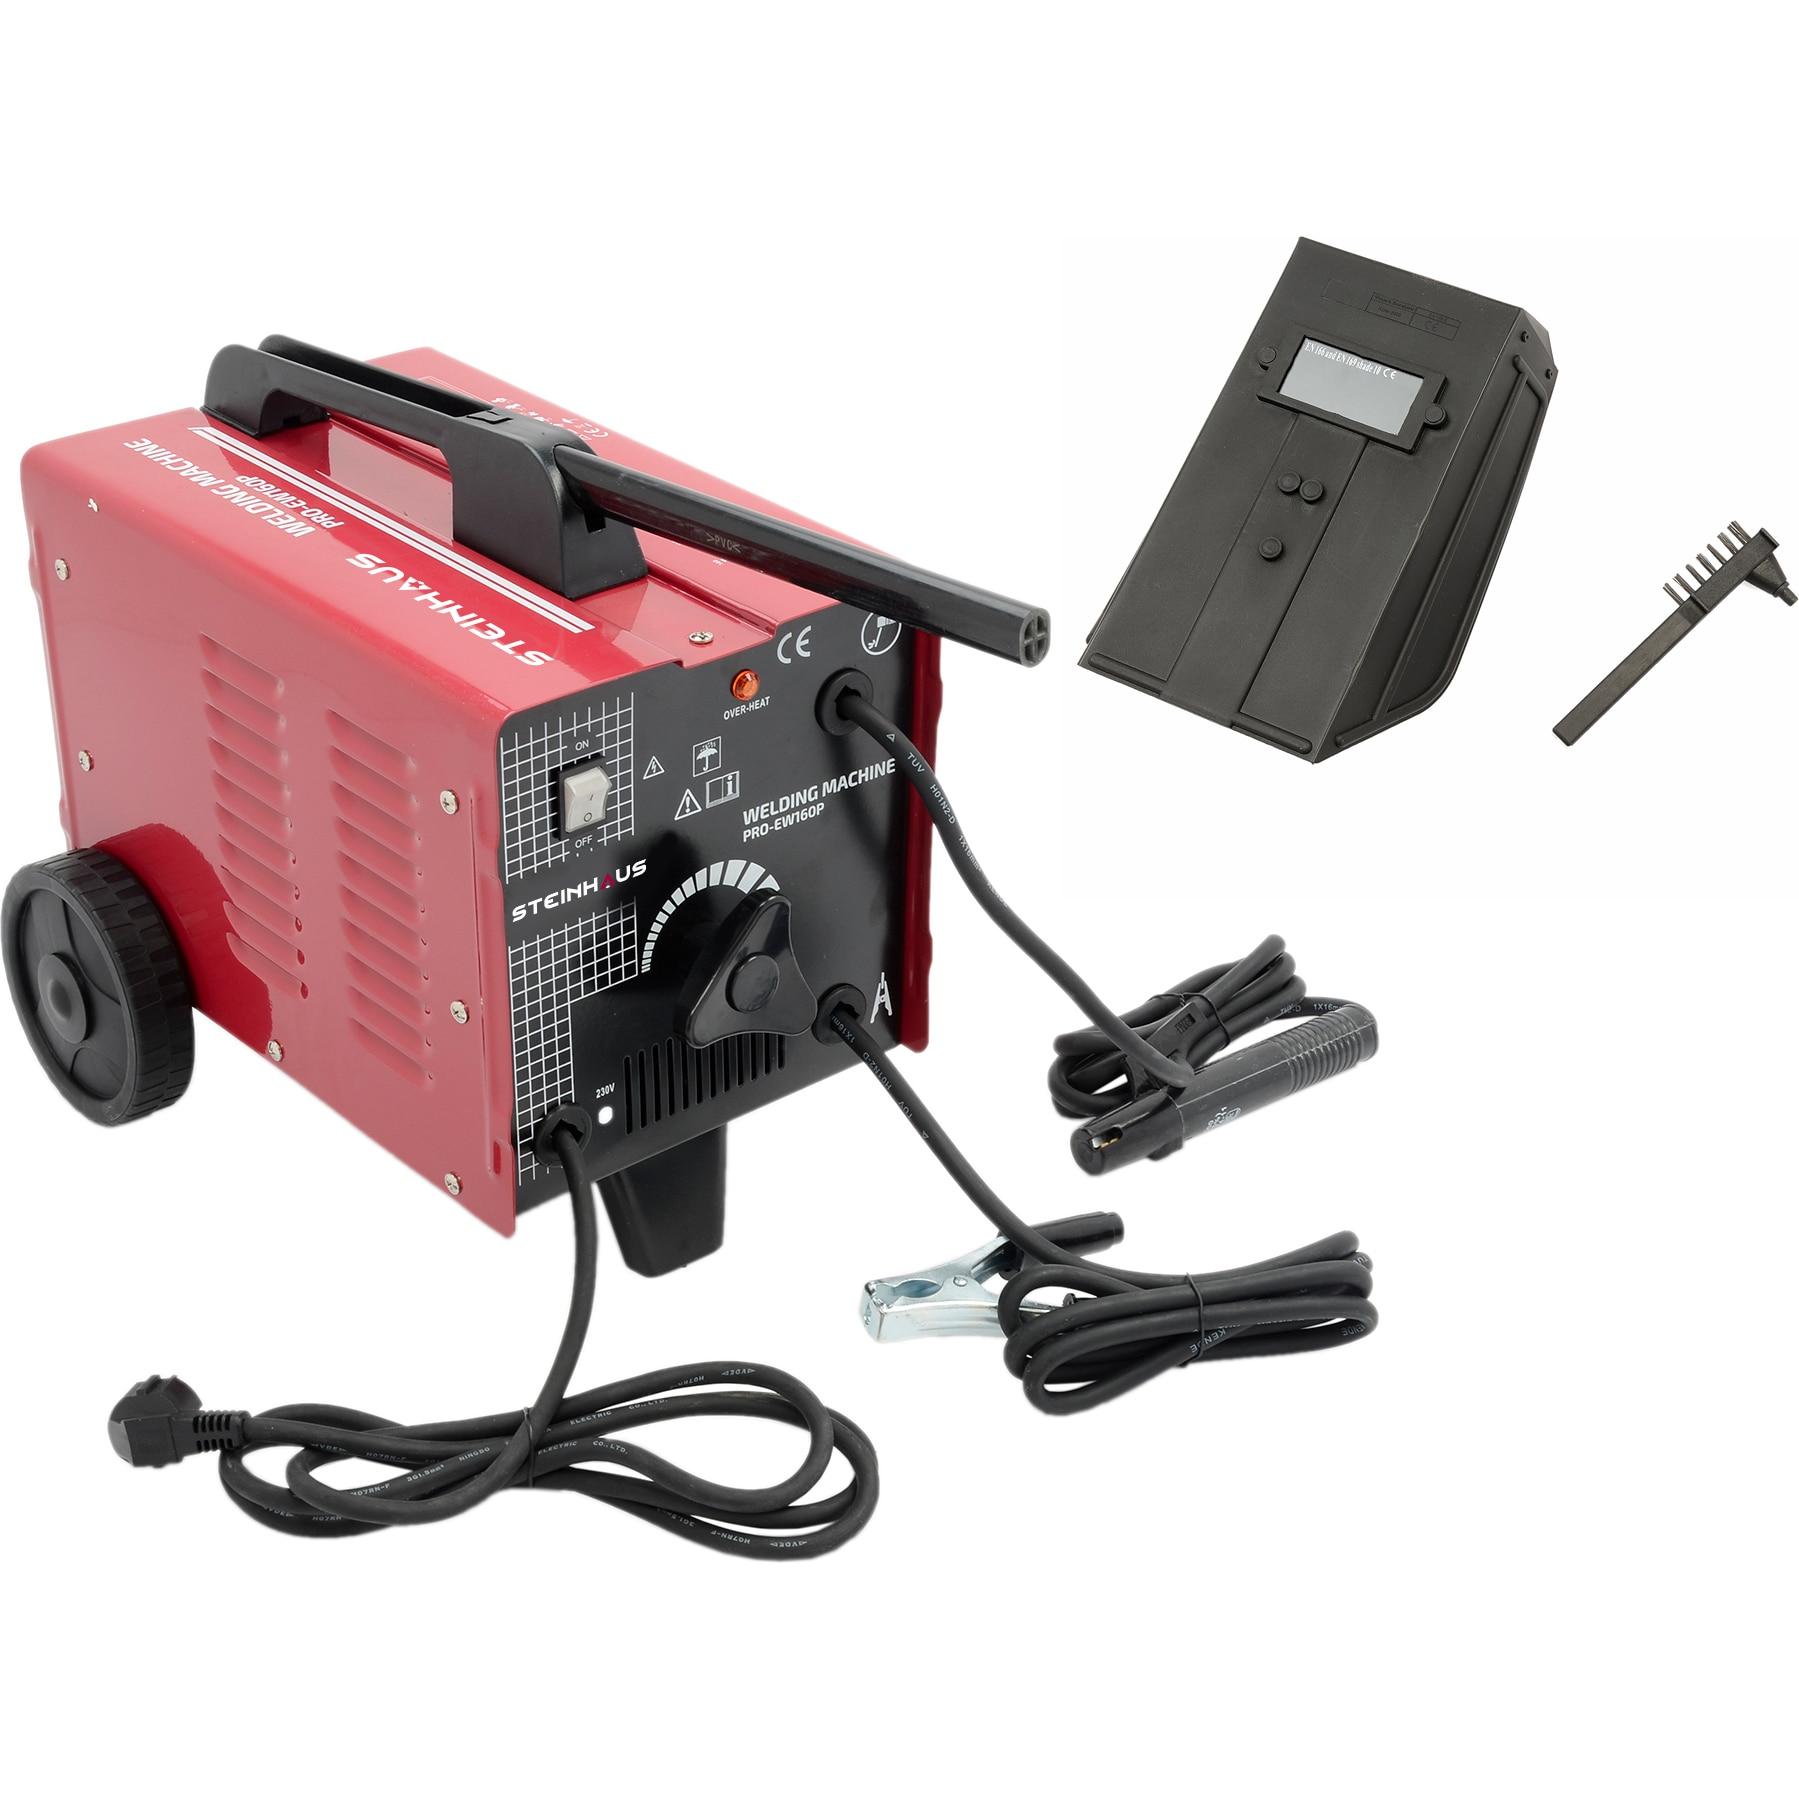 Fotografie Aparat sudura cu ventilator Steinhaus PRO-EW160P, 160A, 230V, Electrod 2-4mm, 17.5kg, Accesorii incluse